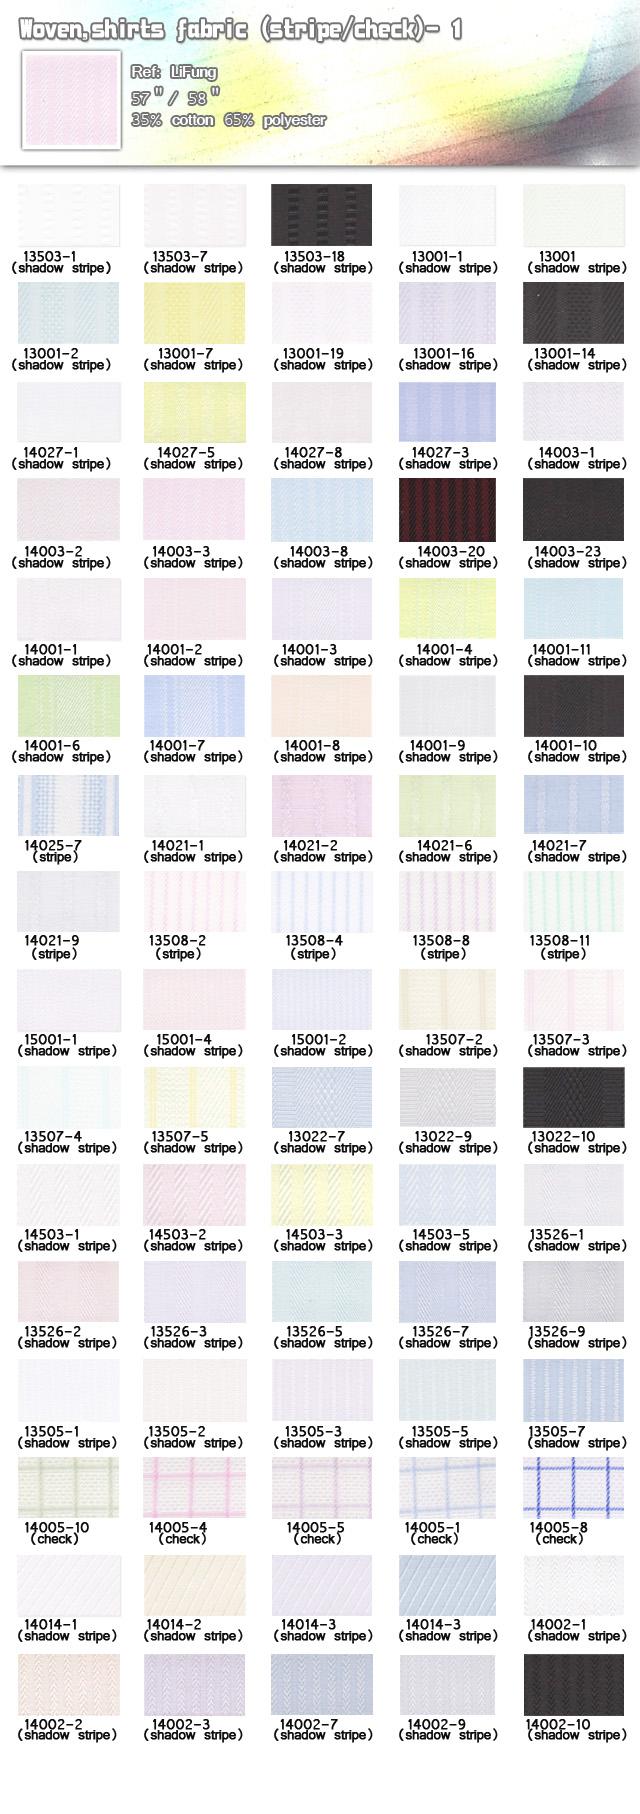 Fabric-Woven-shirts fabric-stripe check-35% cotton-65% polyester-20110602